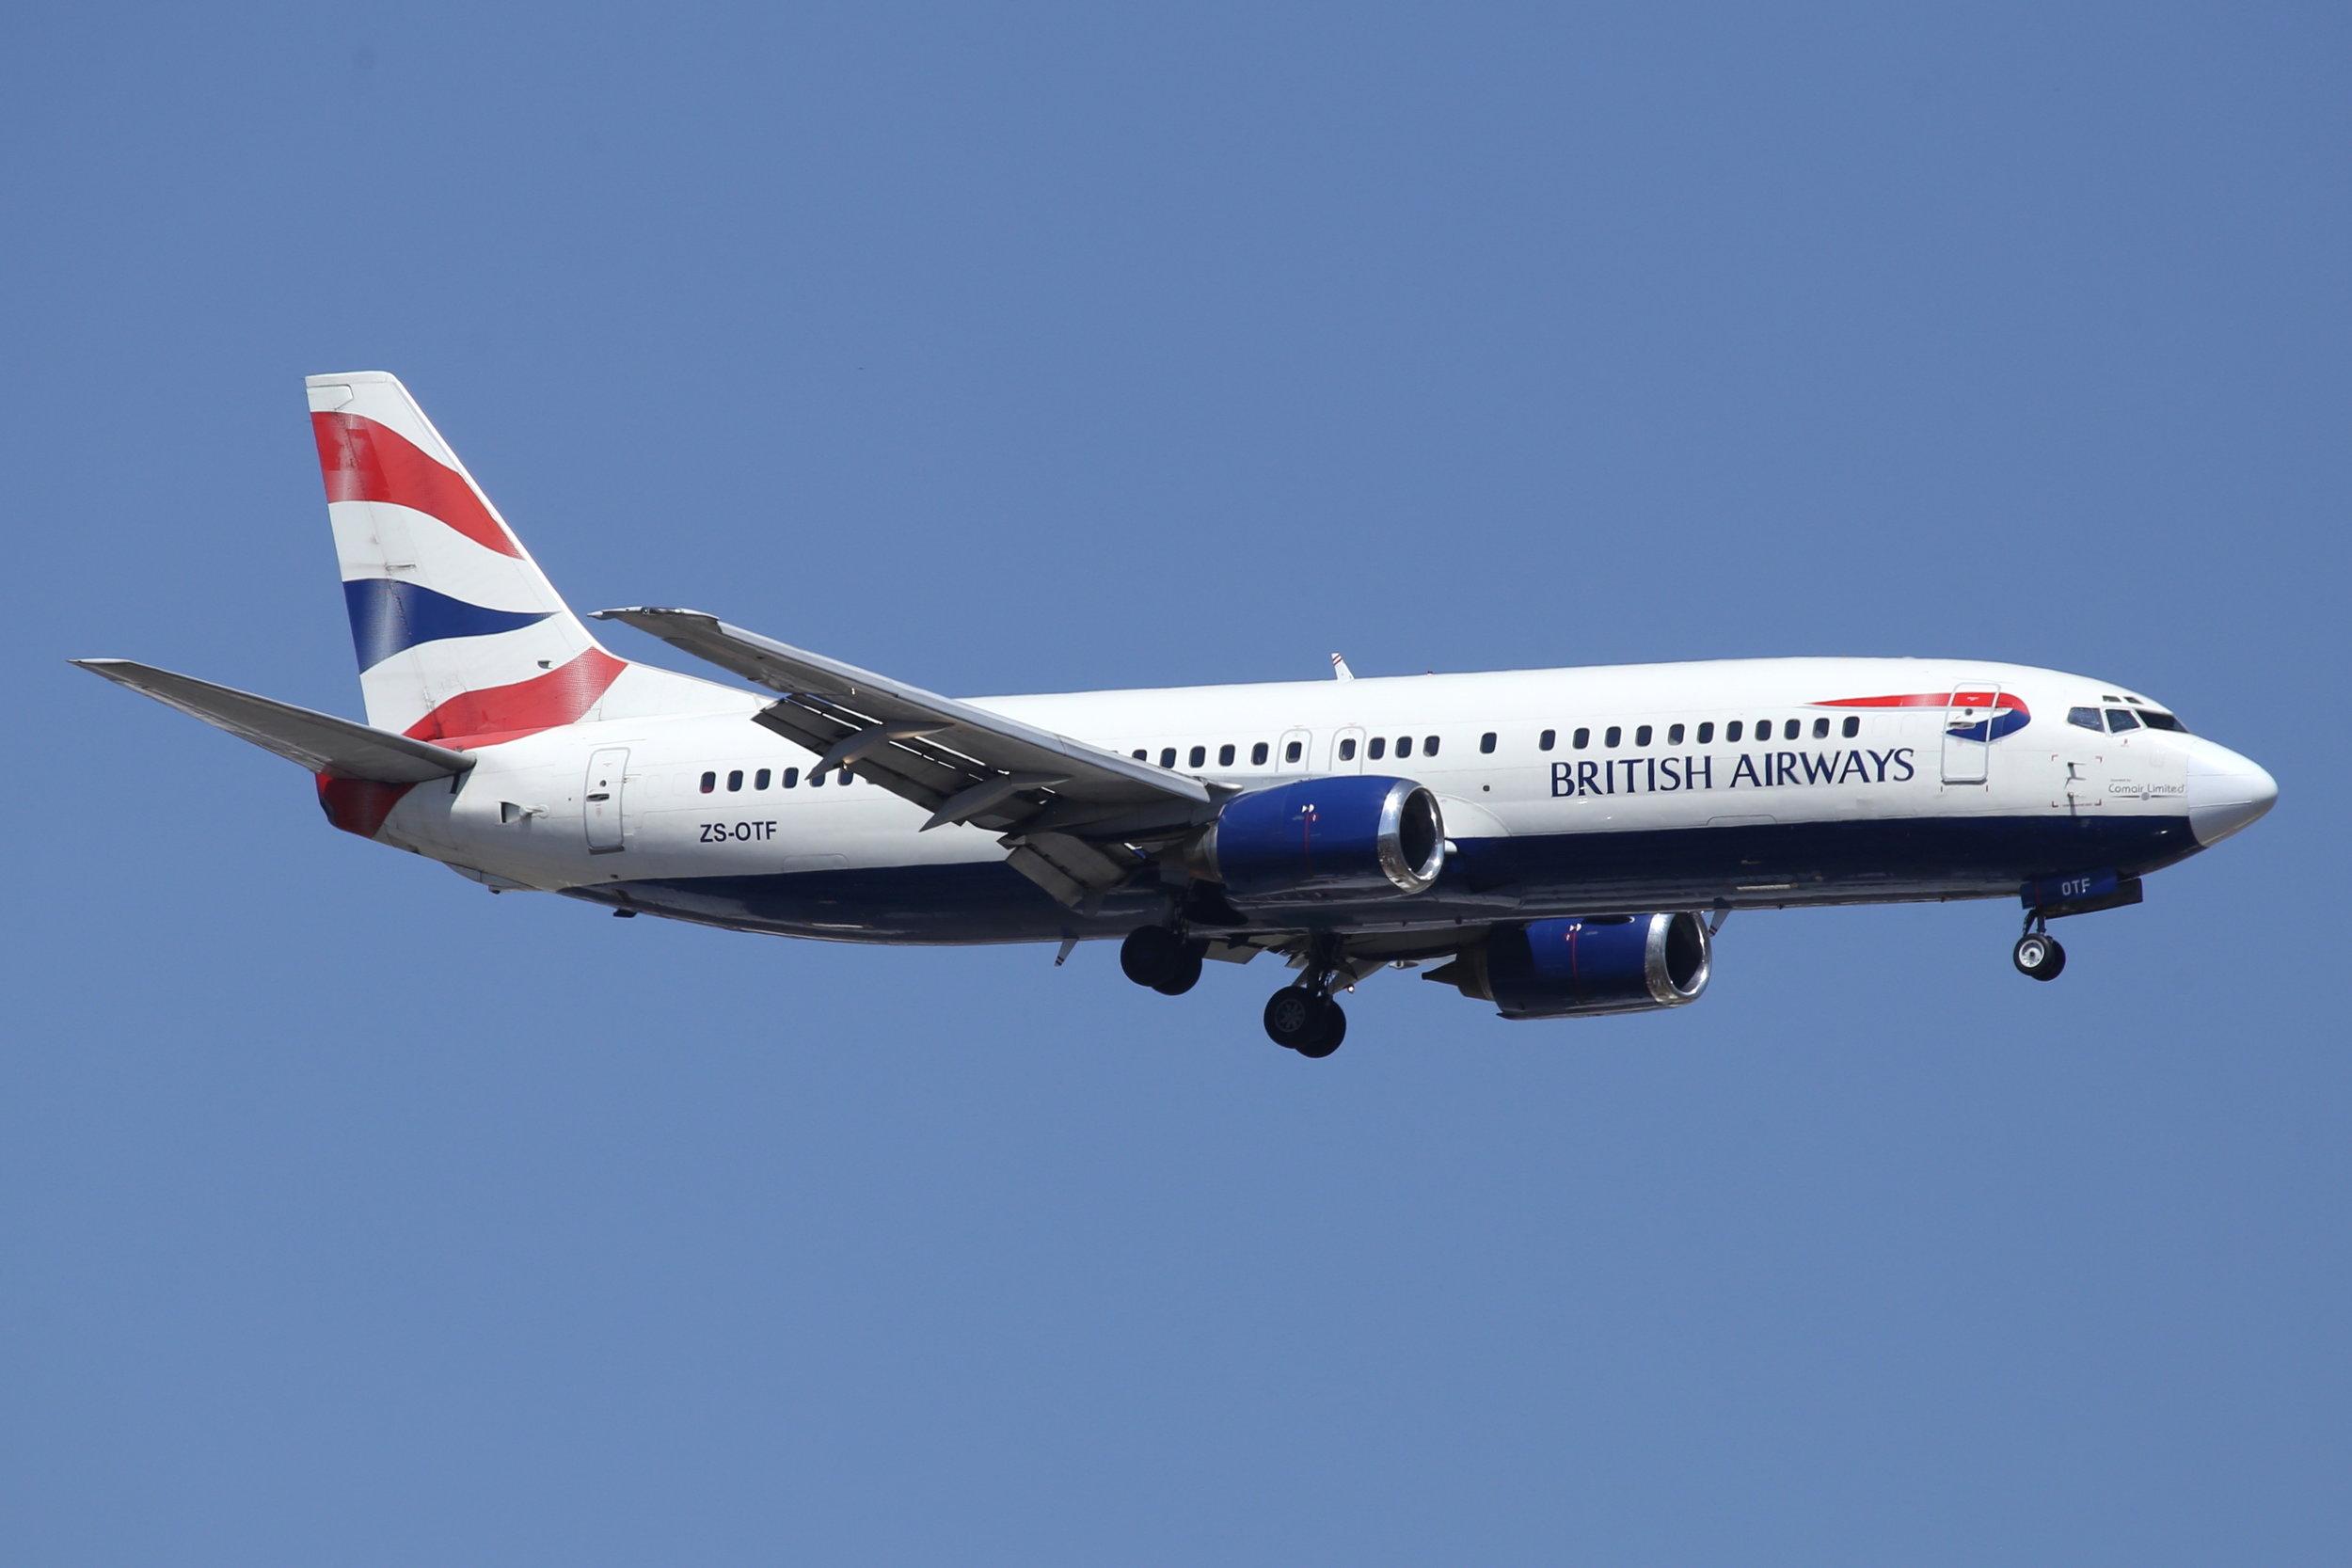 ZS-OTF British Airways/Comair B737-4 taken at Johannesburg 10th November 2018 by John Wood